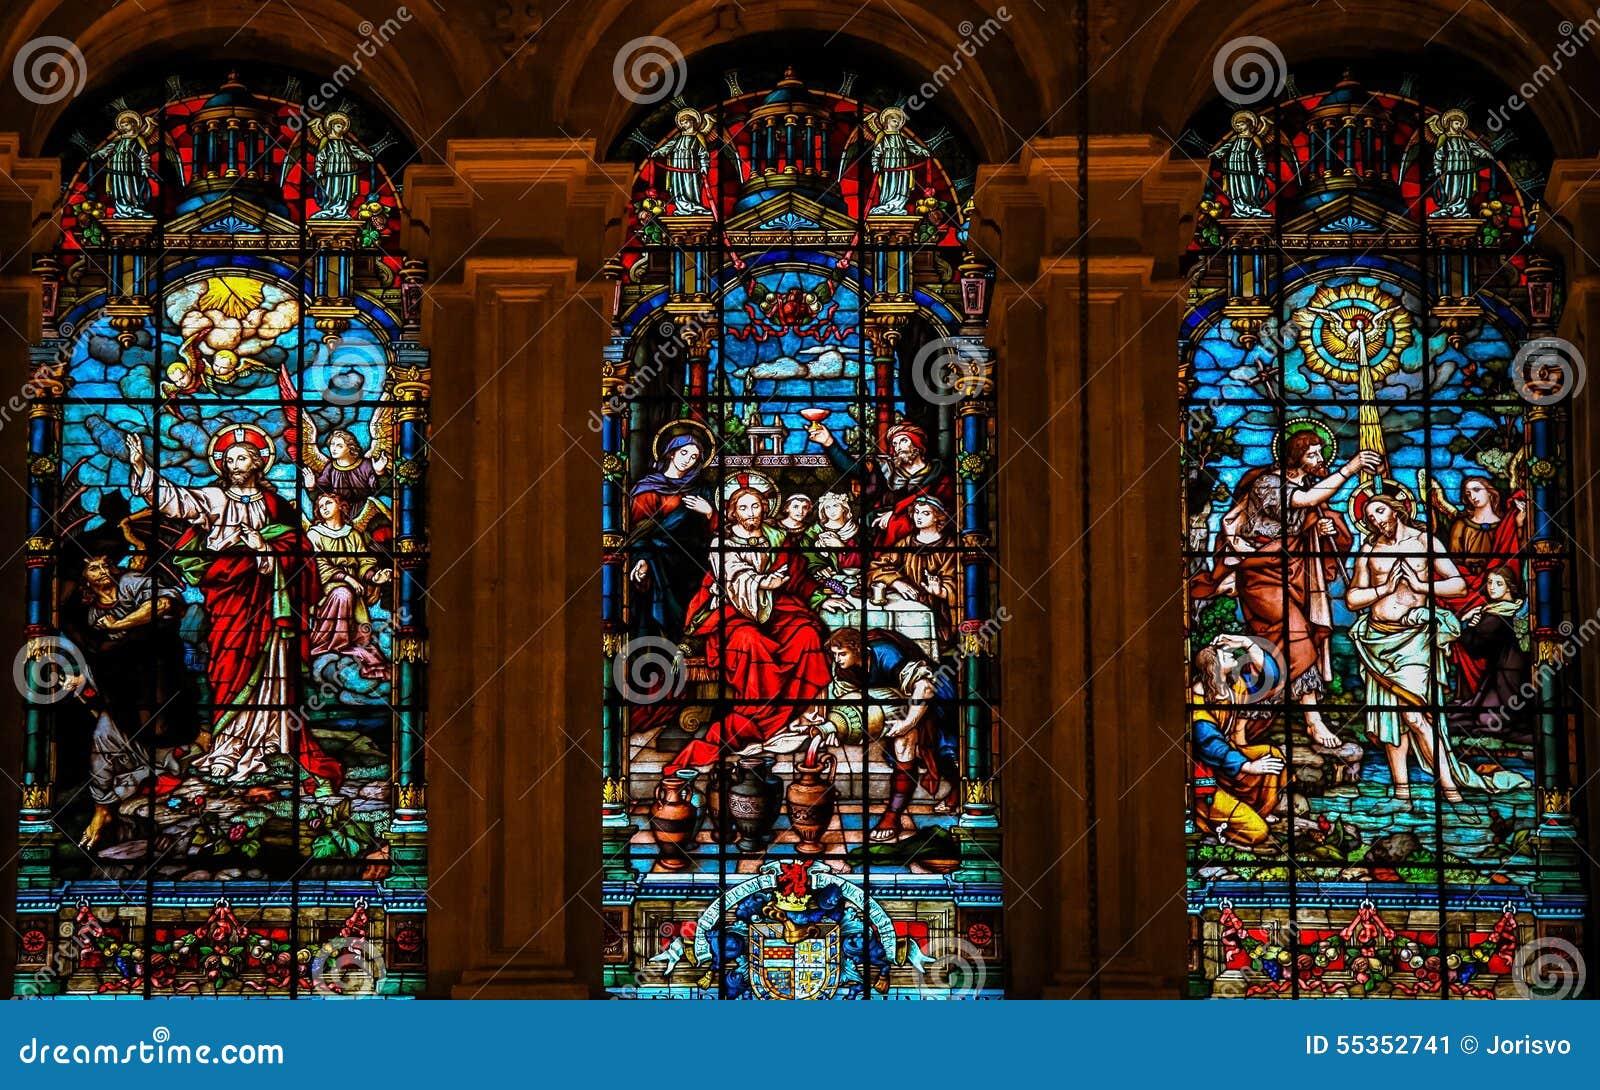 Gesù e Lucifero, Gesù a Cana e battesimo da St John